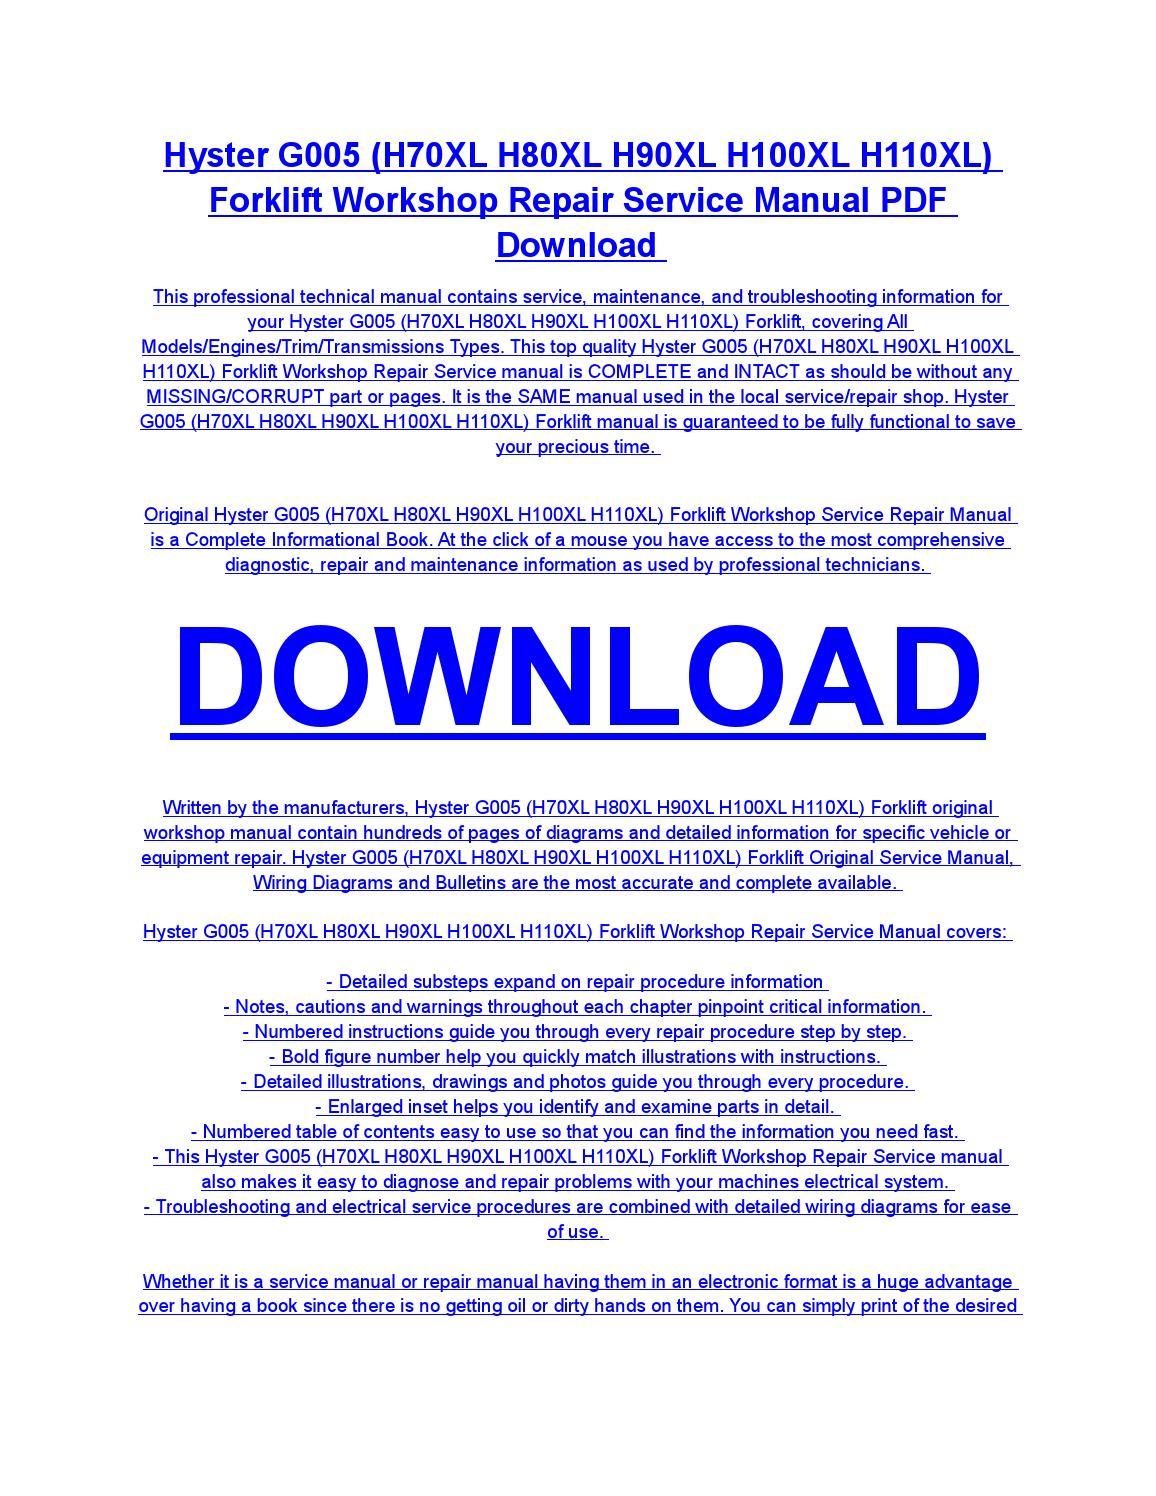 Hyster g005 (h70xl h80xl h90xl h100xl h110xl) forklift service repair  workshop manual download by diaz rondon - issuu